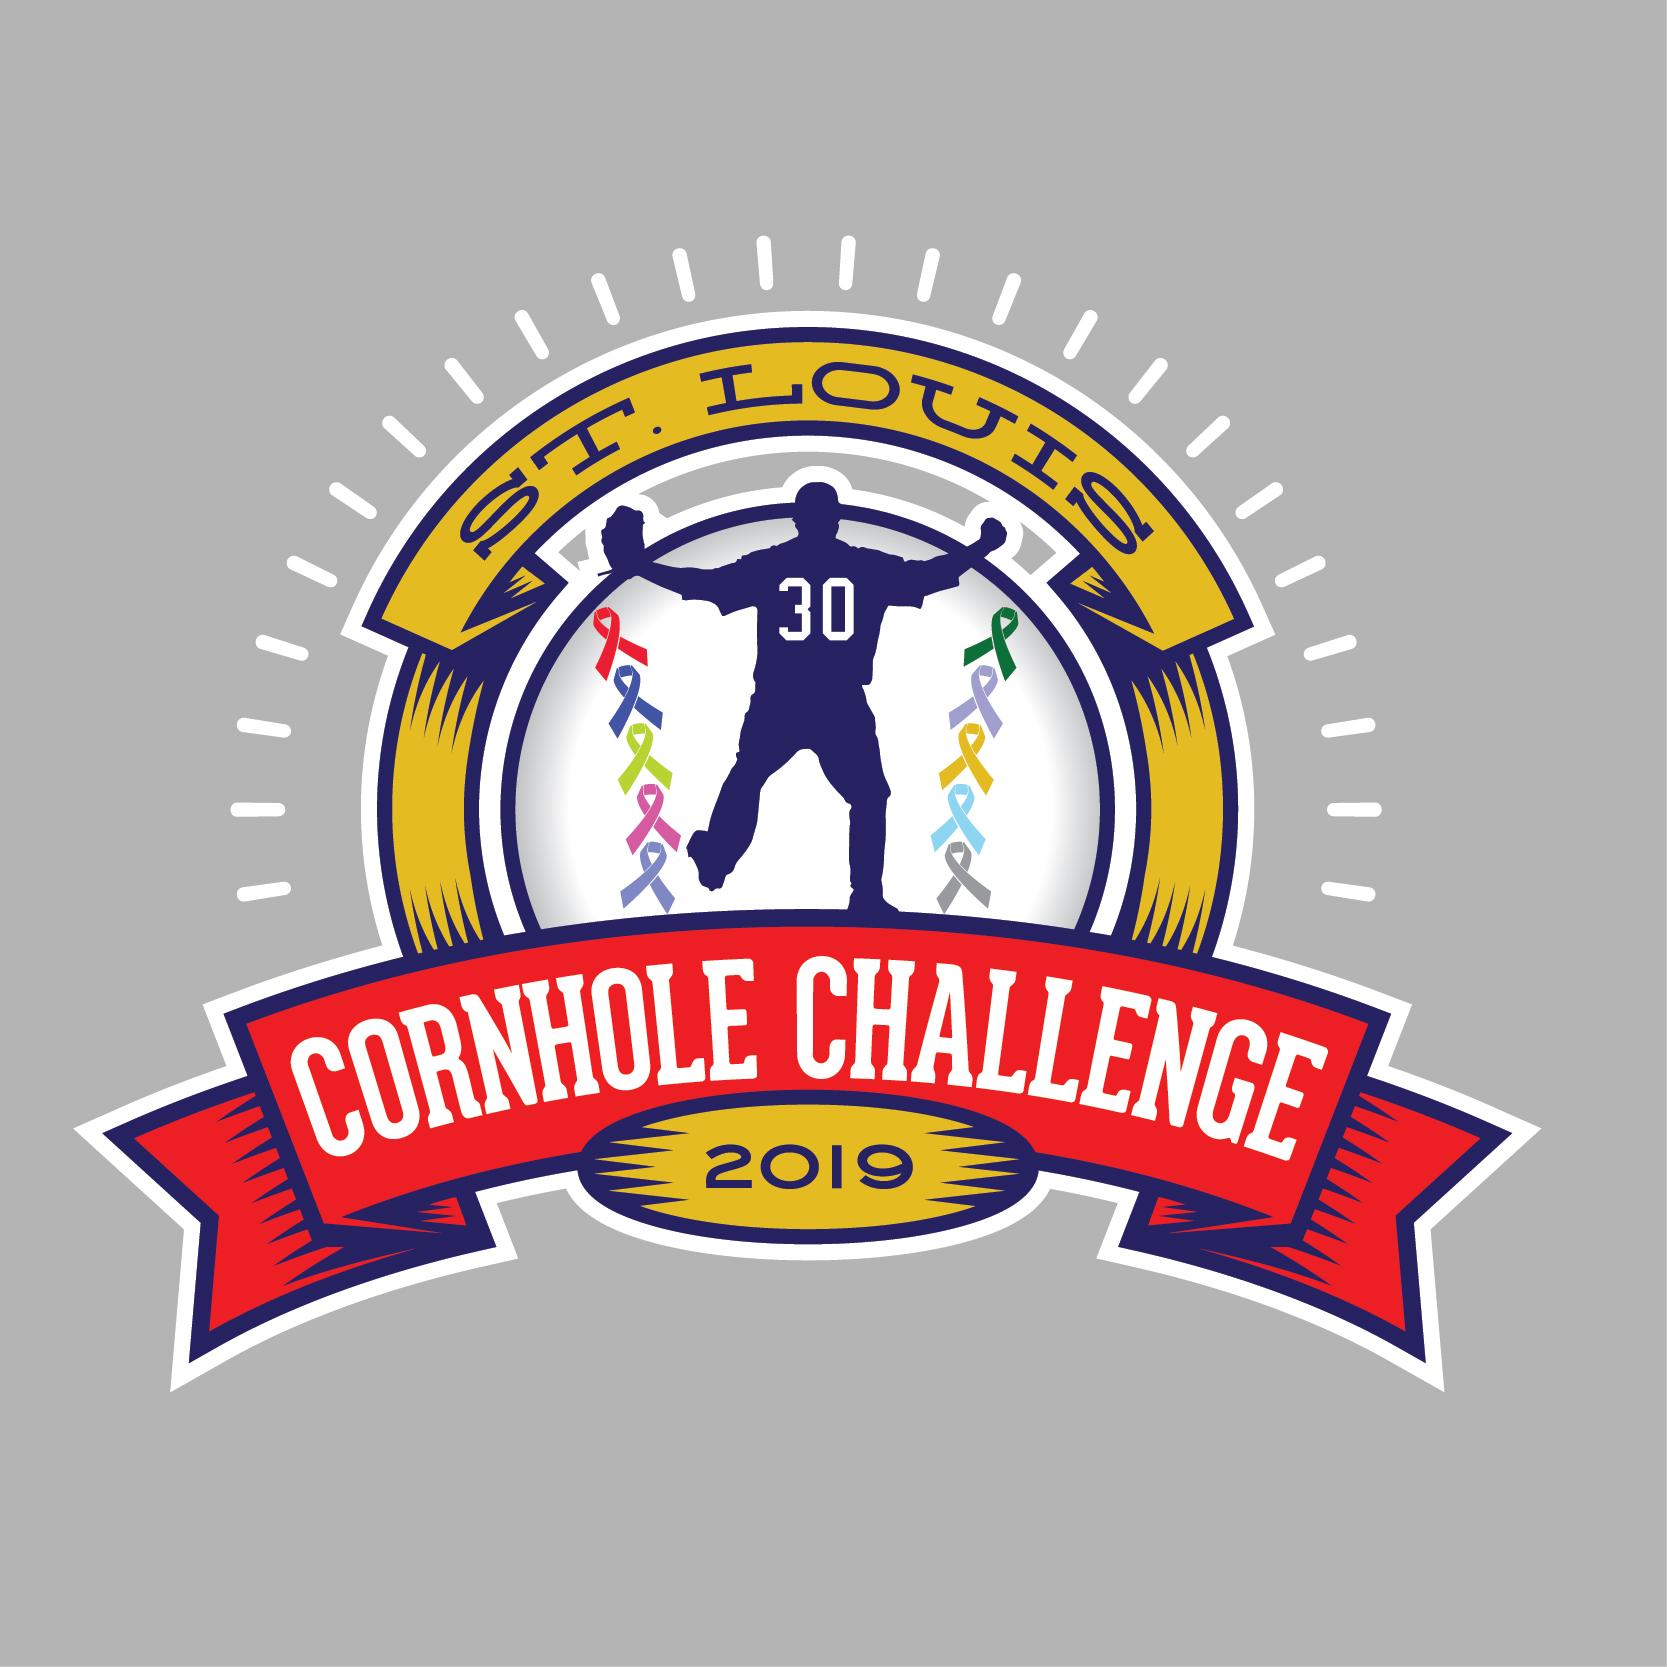 2019 Cornhole Challenge Logo